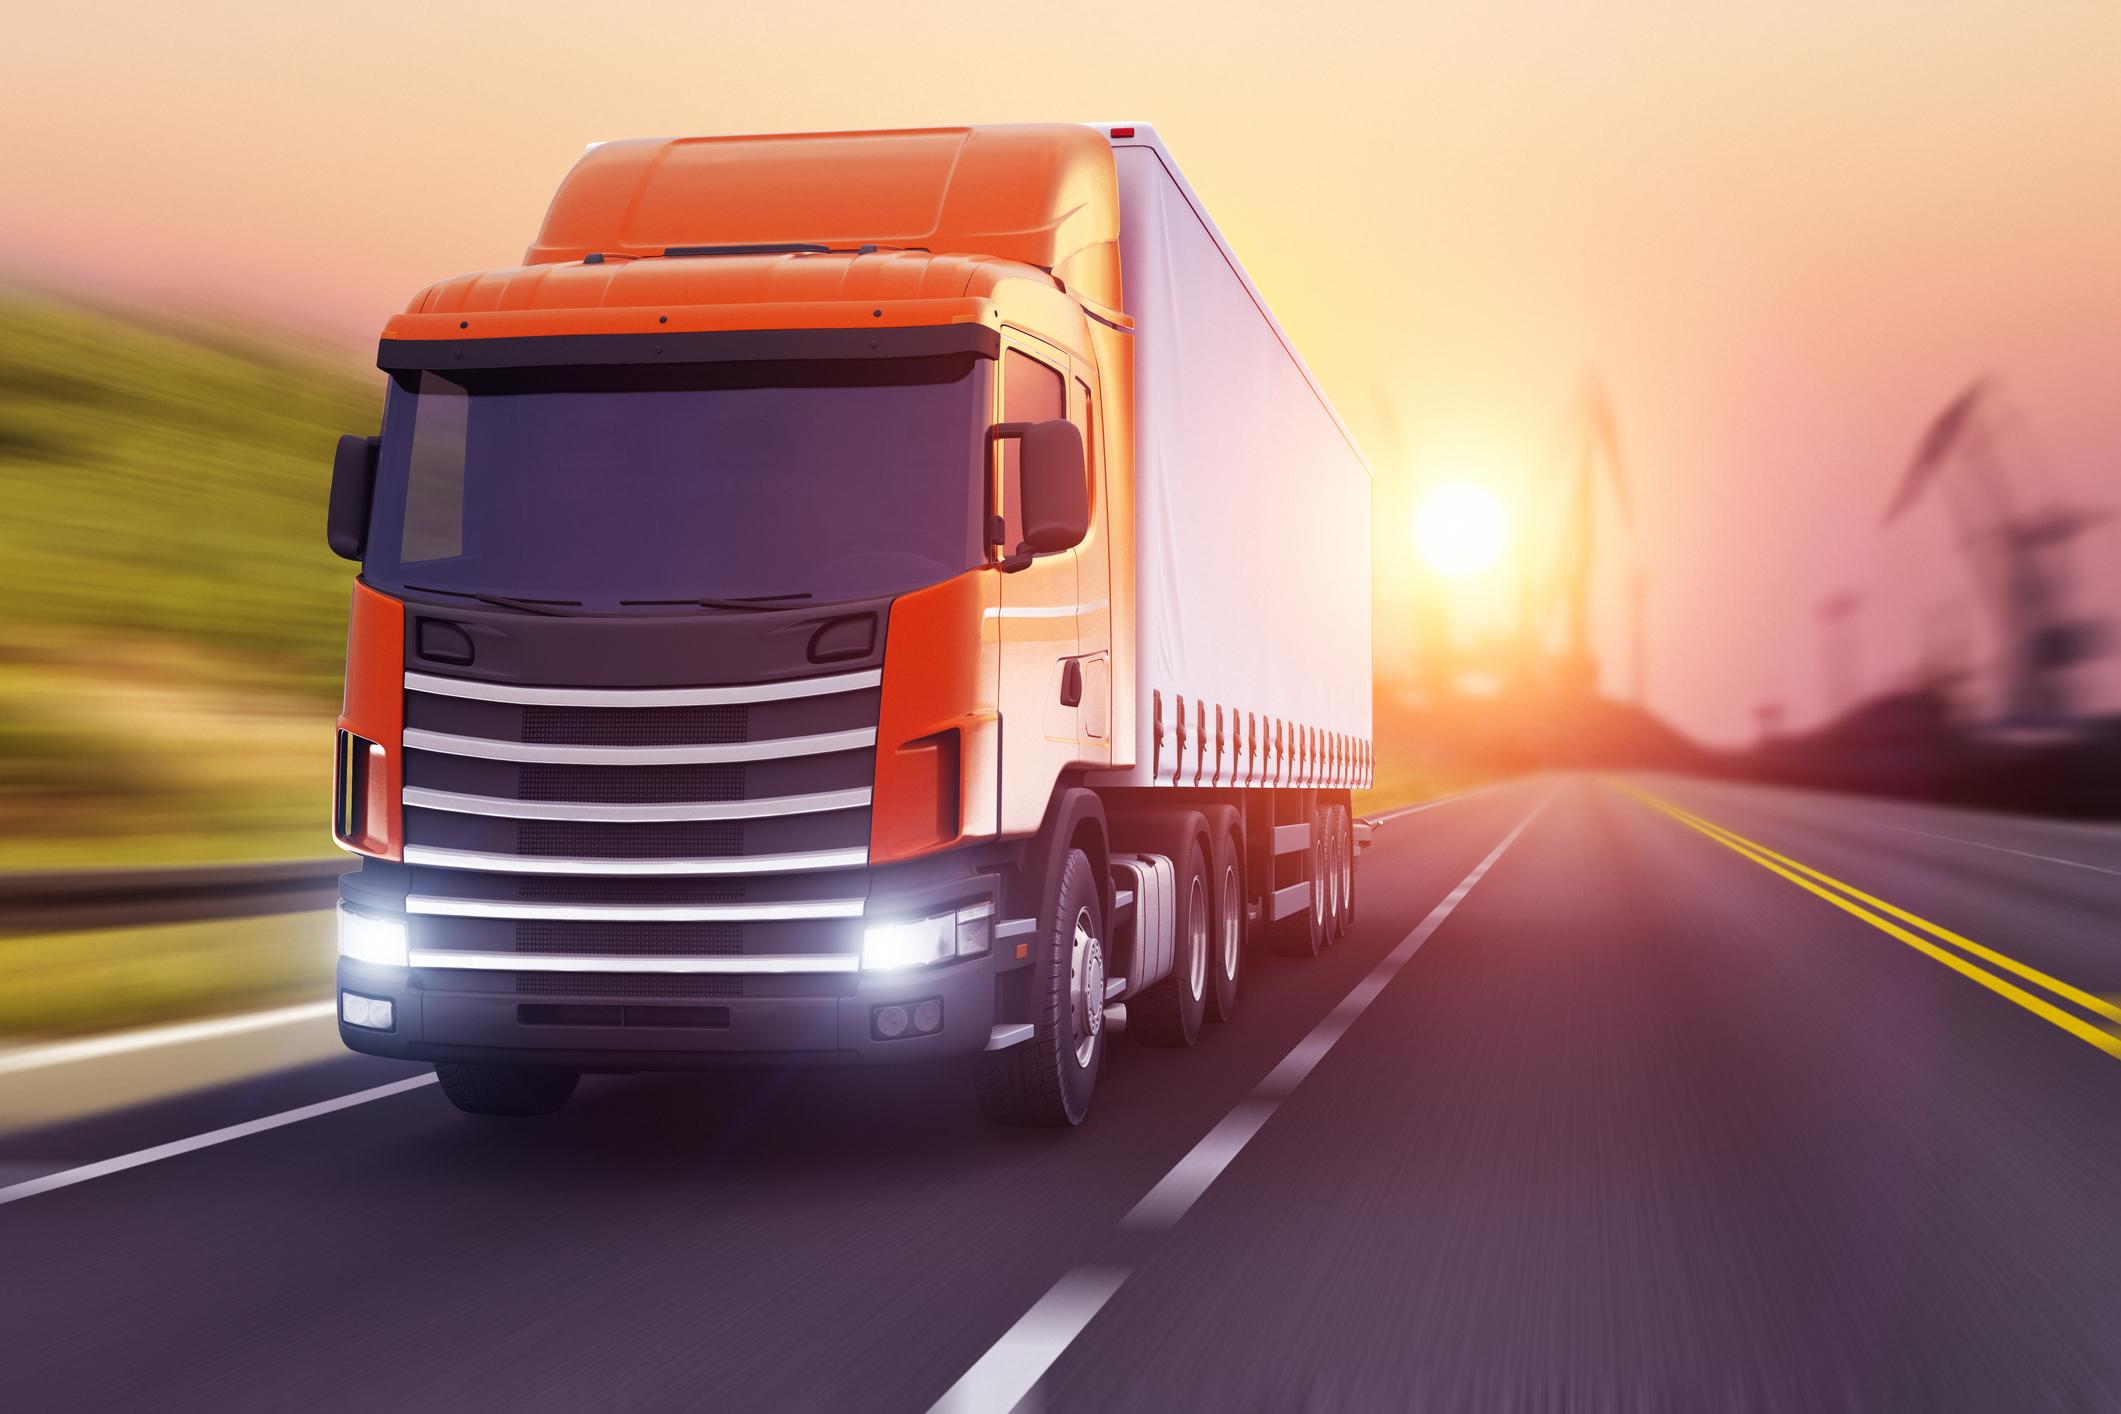 iStock-904315550 - Truck Concept Photo B.jpg